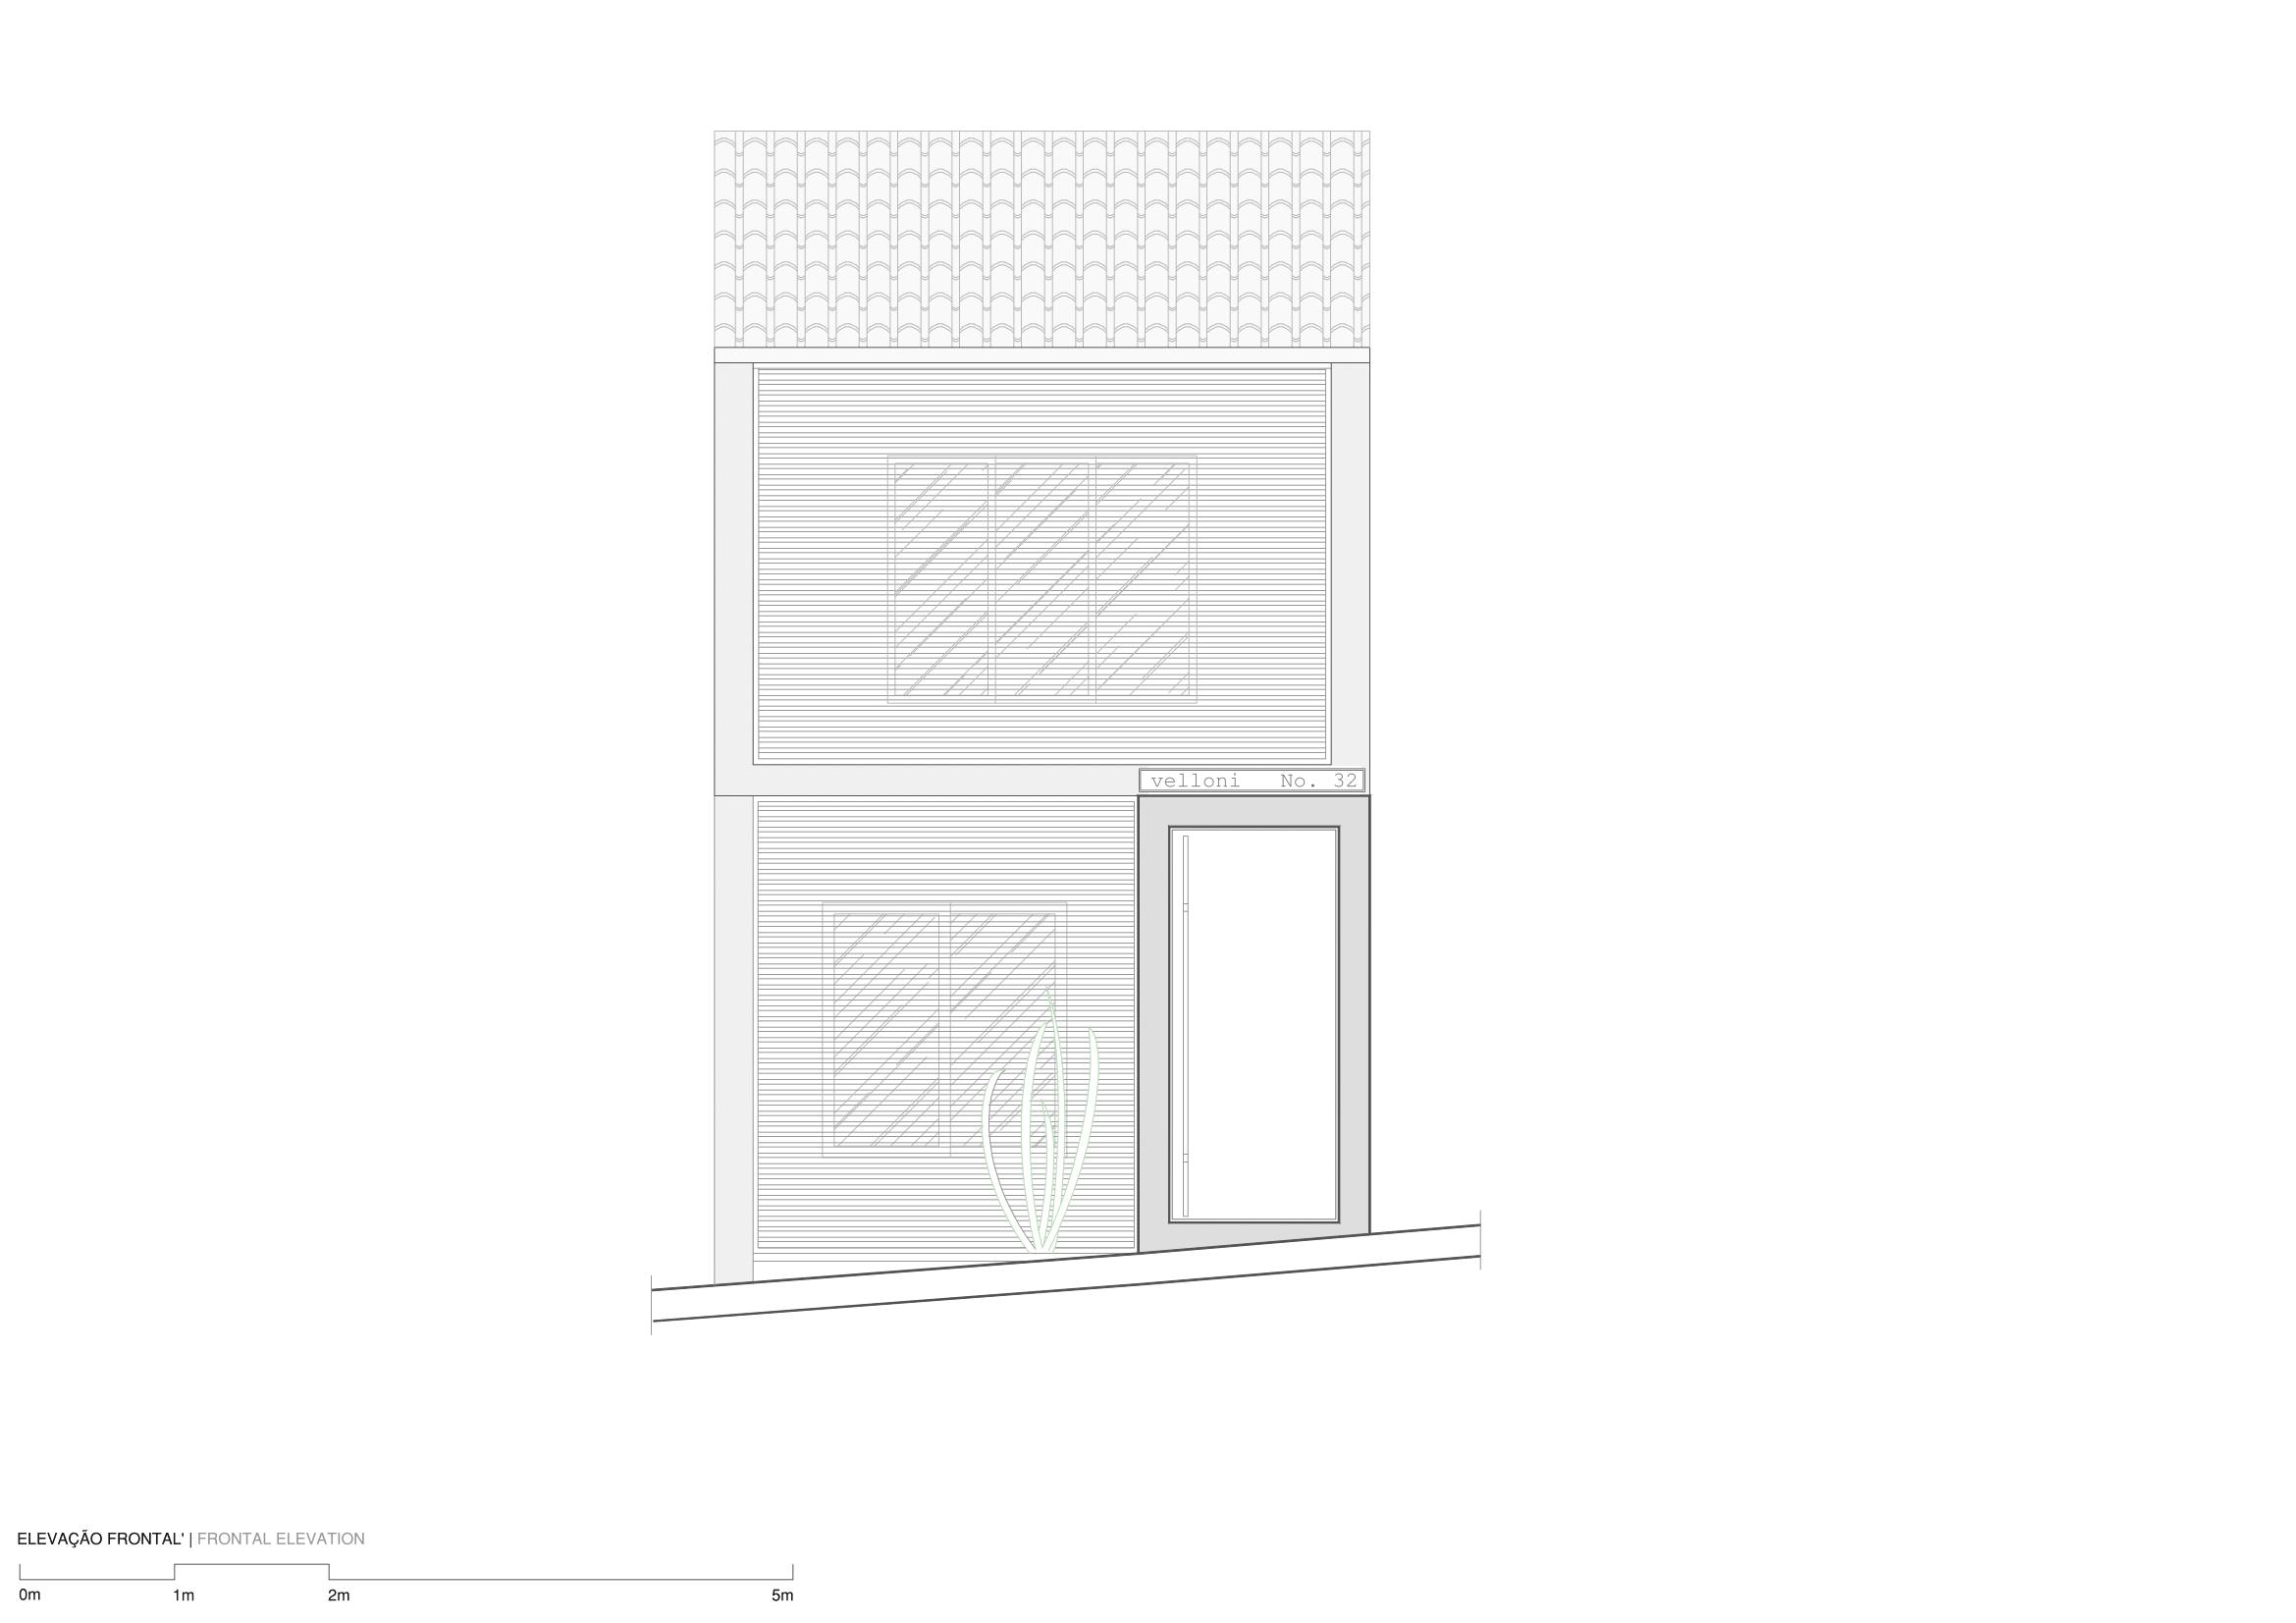 hobjeto-arquitetura-produtora-velloni-ap-03-elevacaofrontal